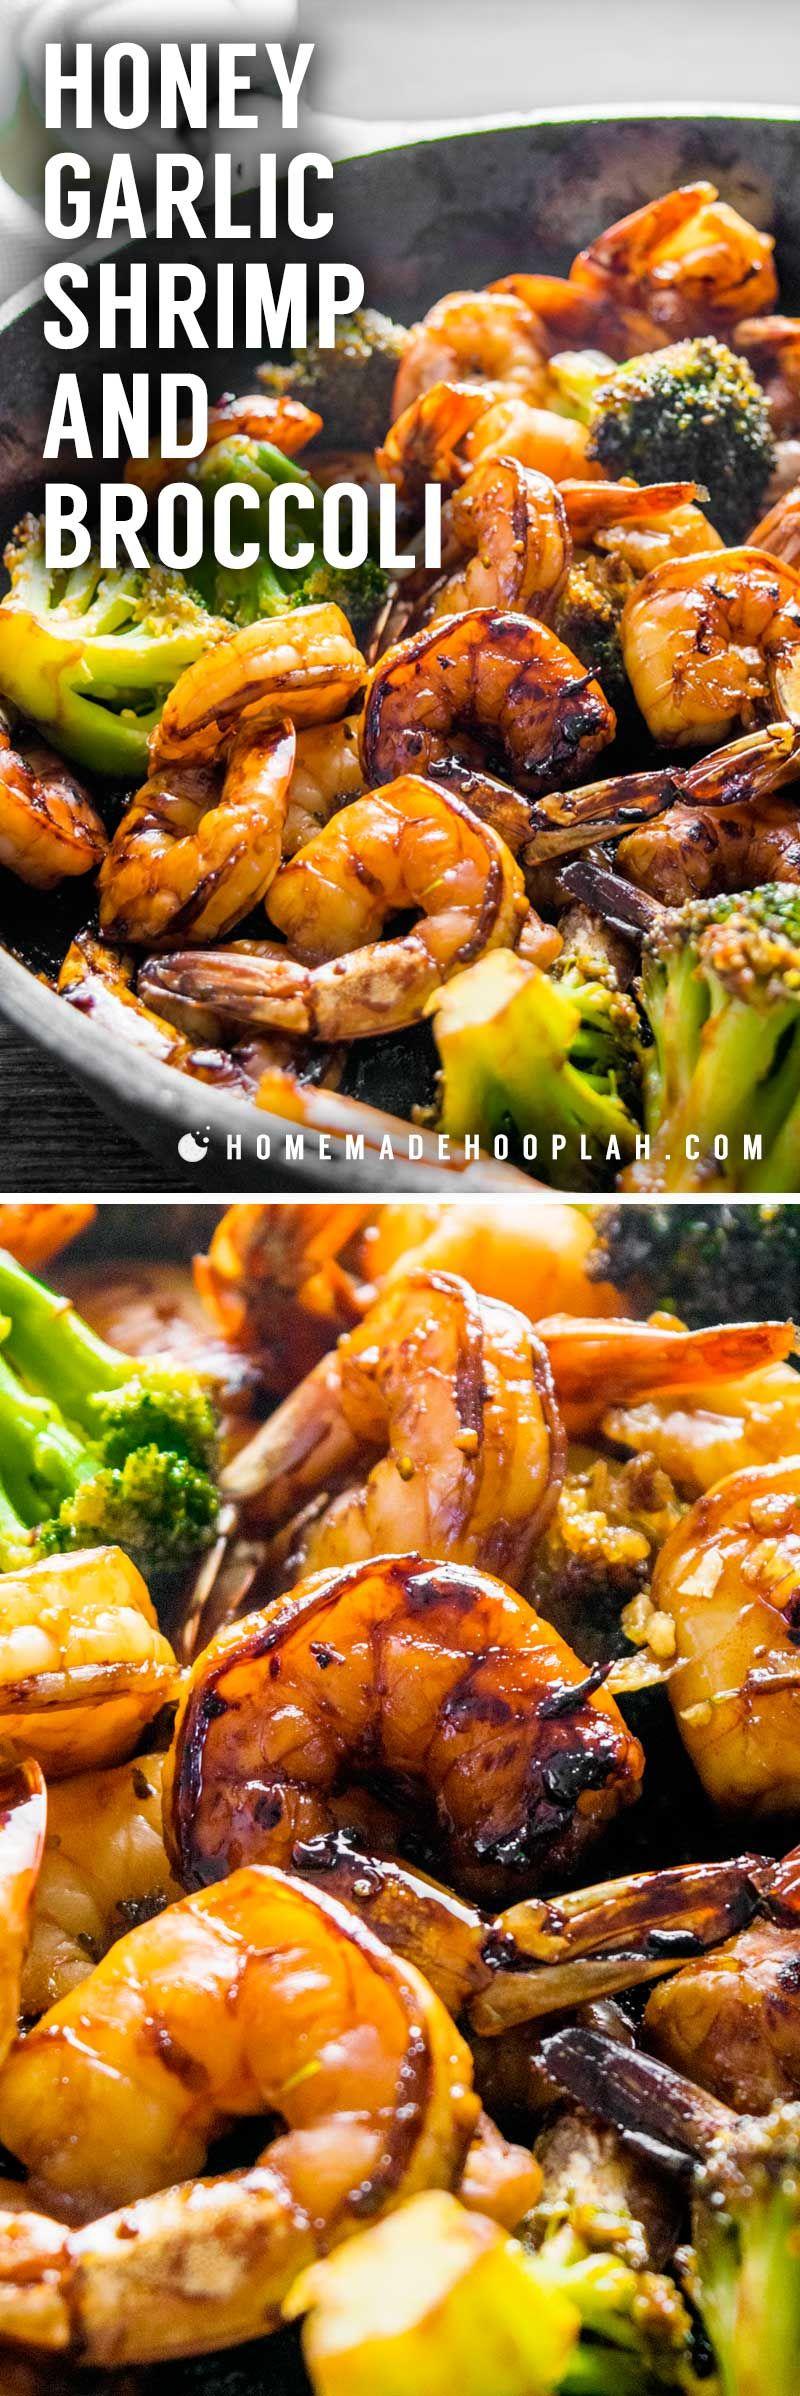 Photo of Honey Garlic Shrimp and Broccoli